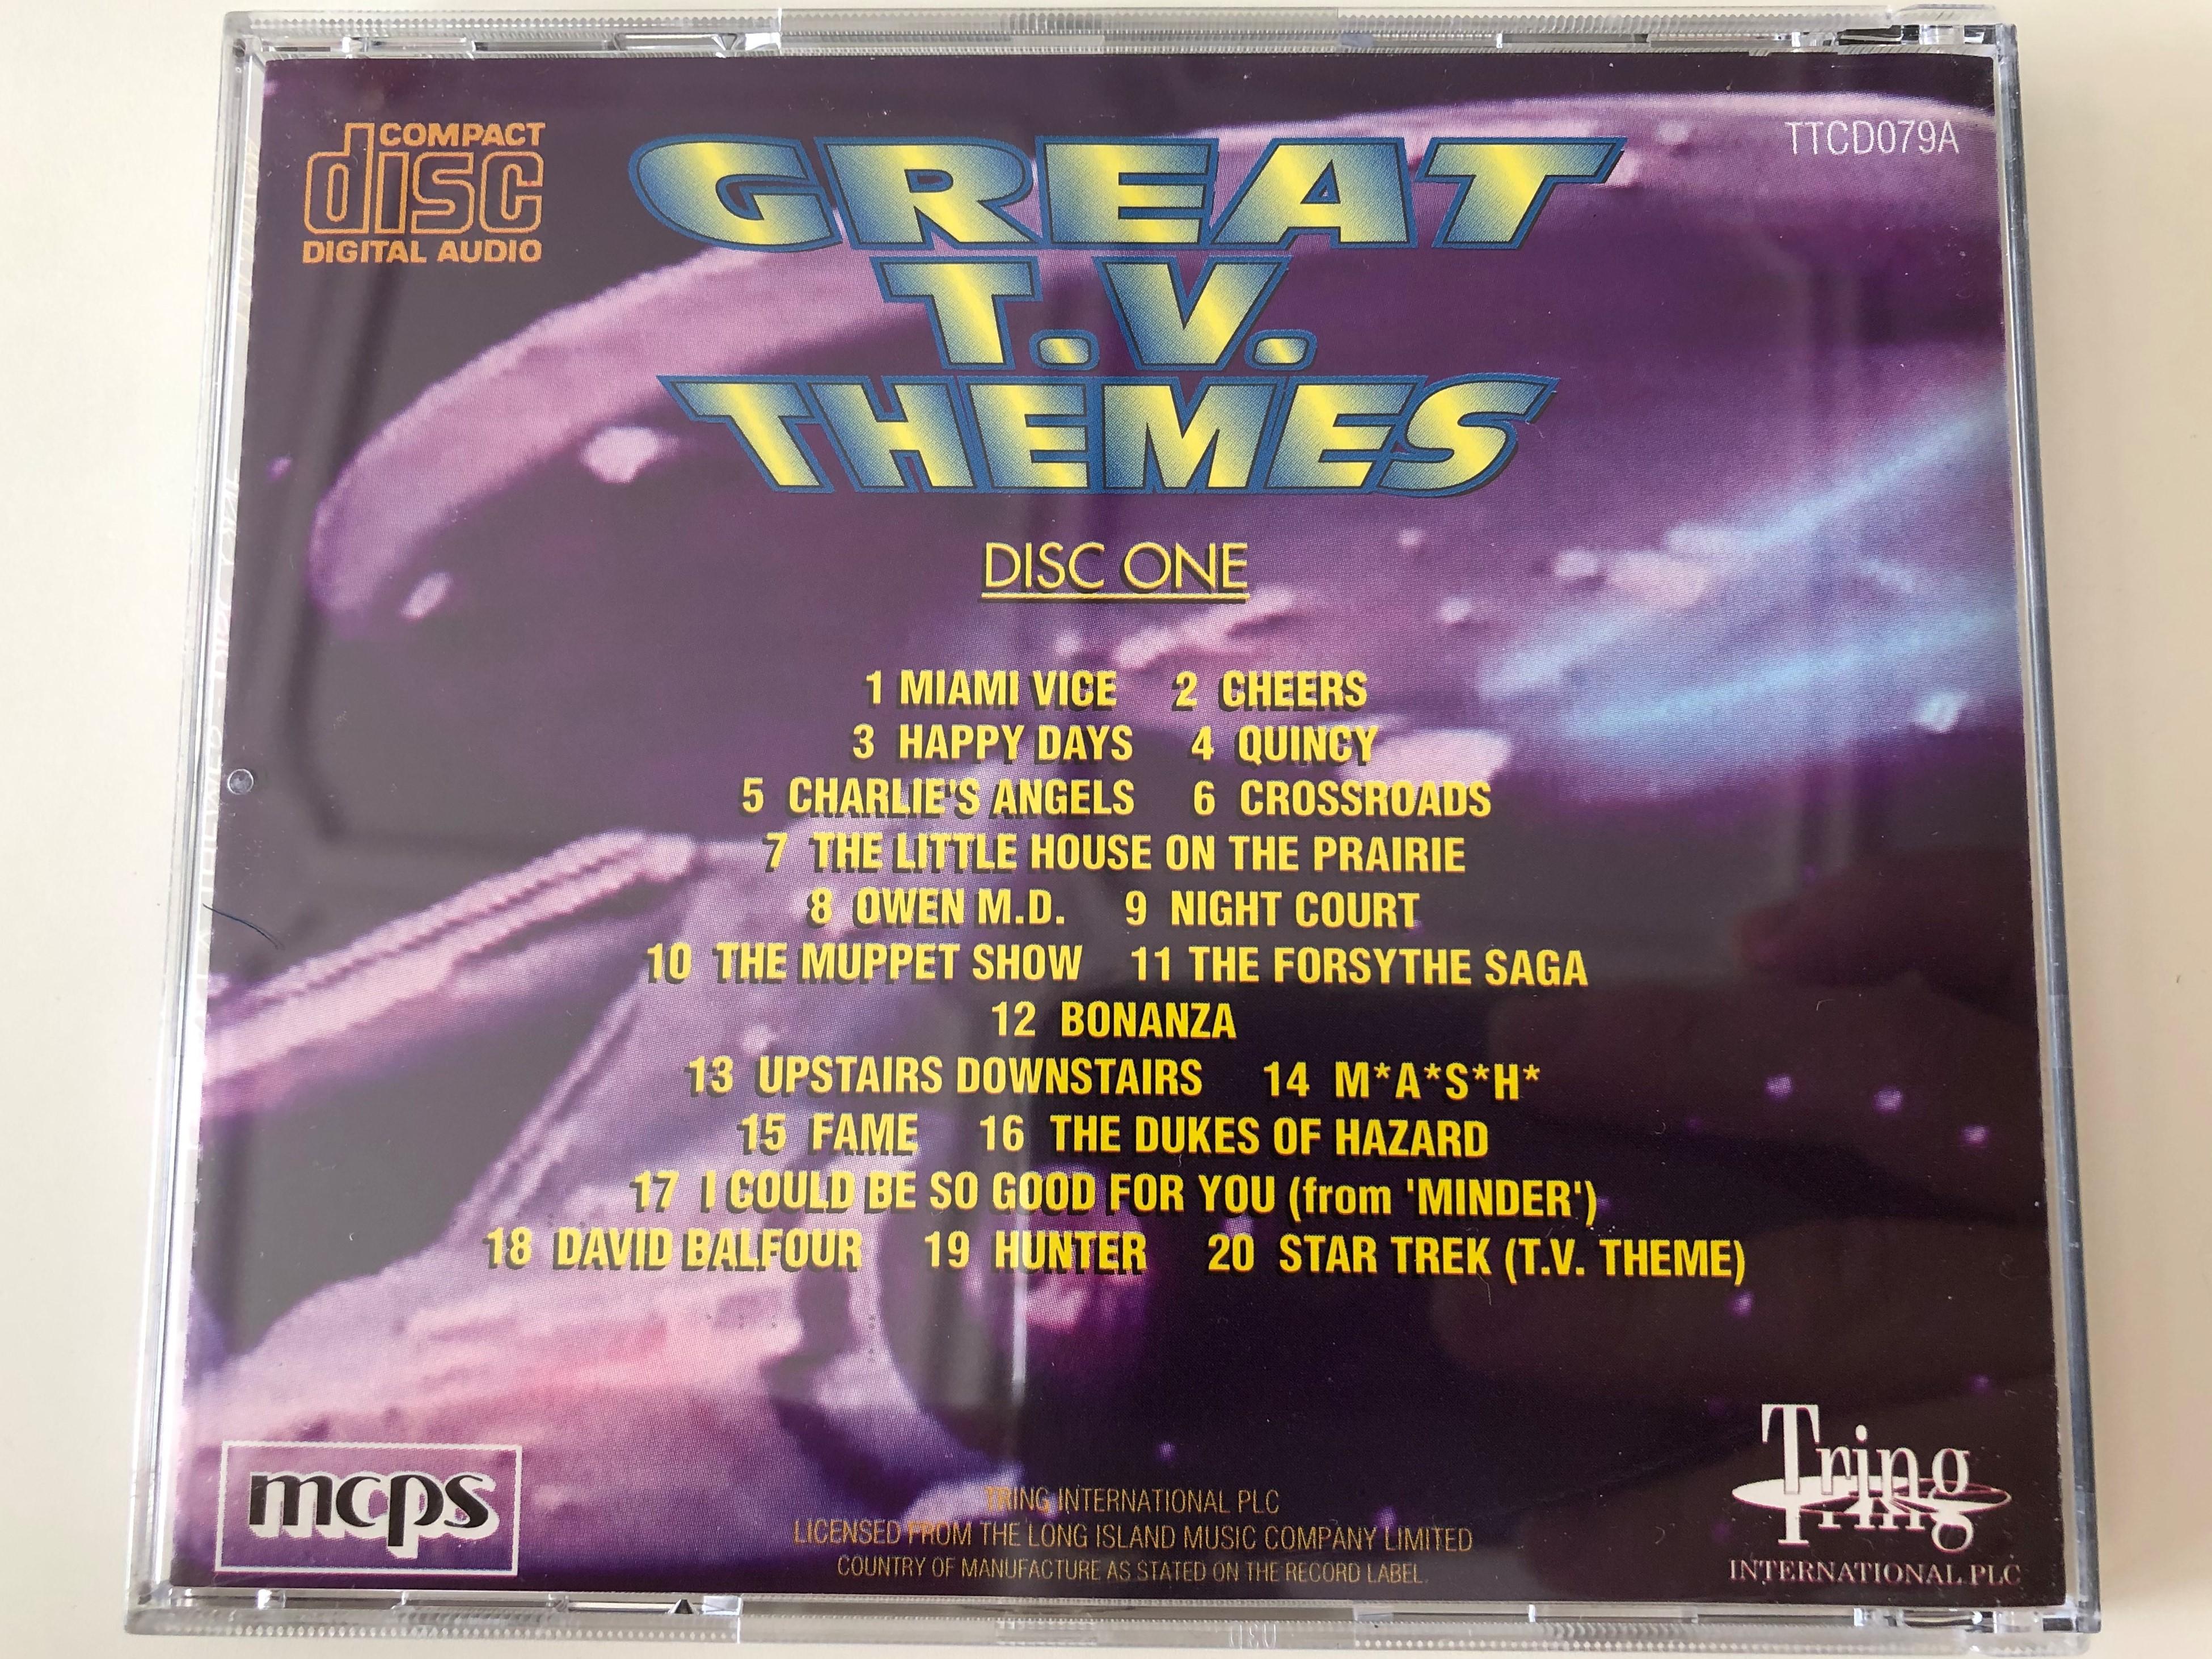 great-t.v.-themes-disc-one-tring-international-plc-audio-cd-ttcd079a-4-.jpg